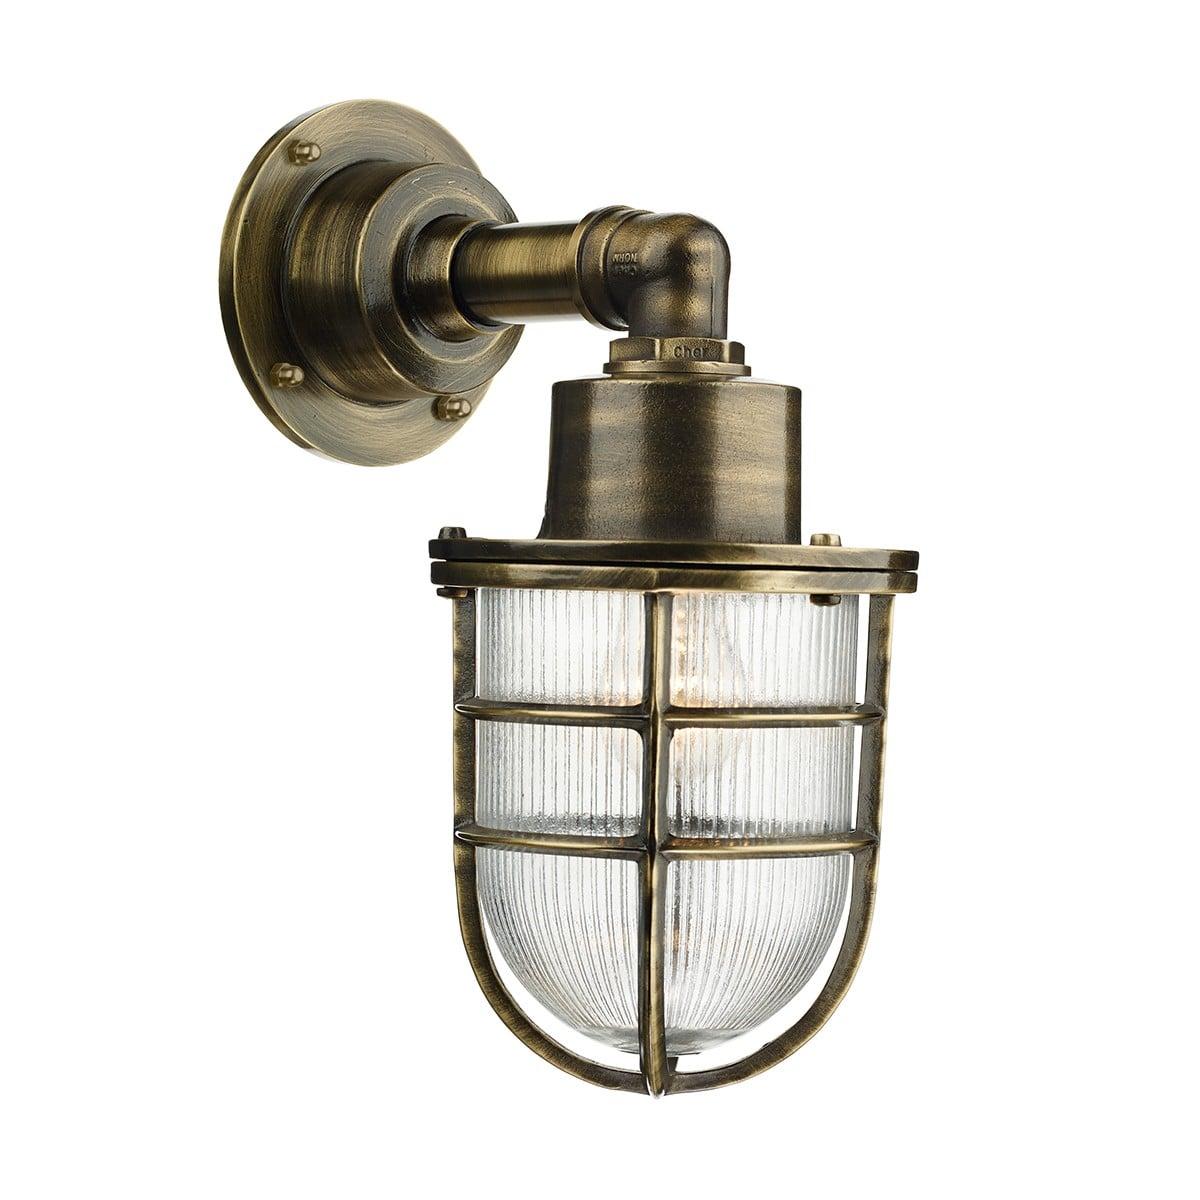 David Hunt Lighting CRE1575 Crewe 1 light wall light, Antique Brass